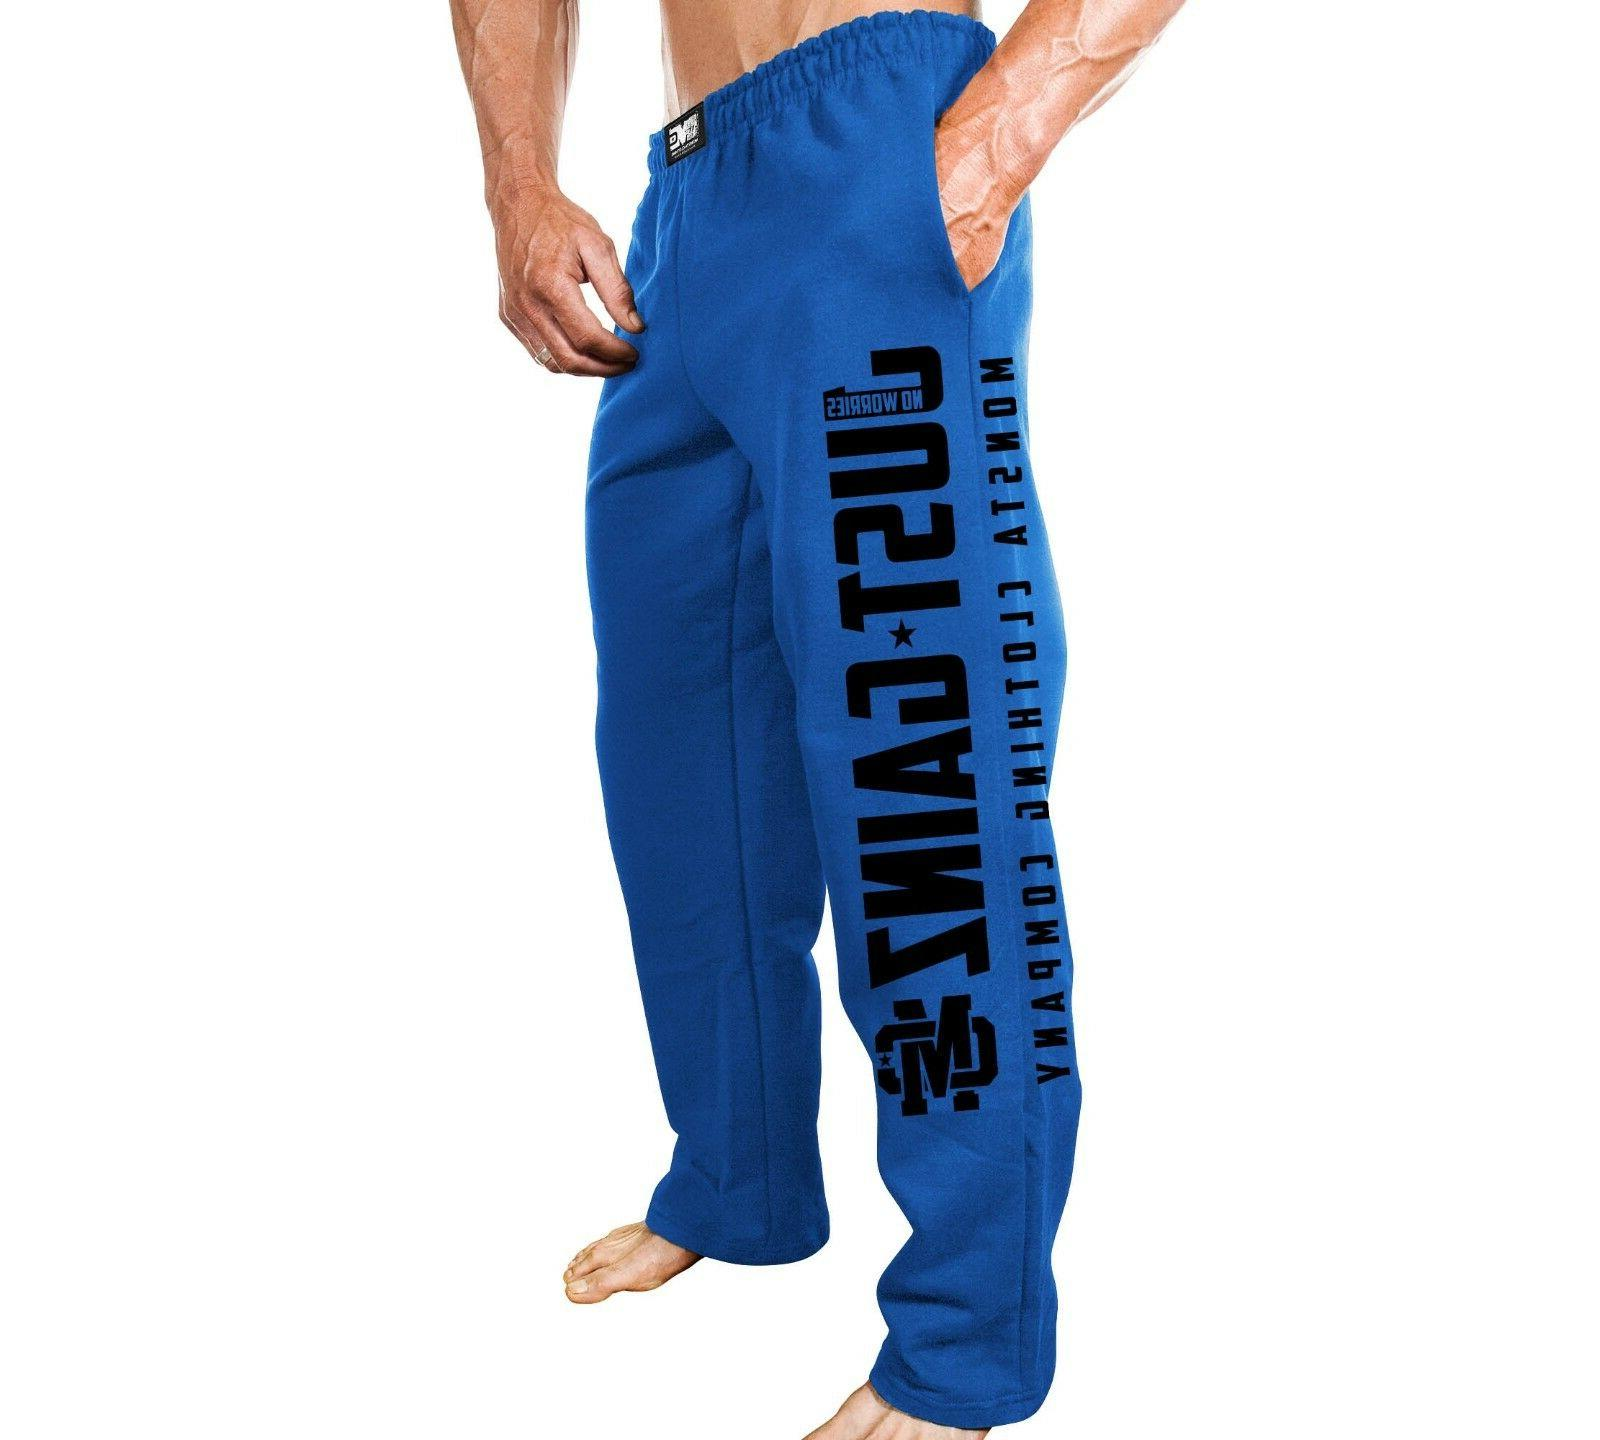 New Monsta Fitness Sweatpants Just